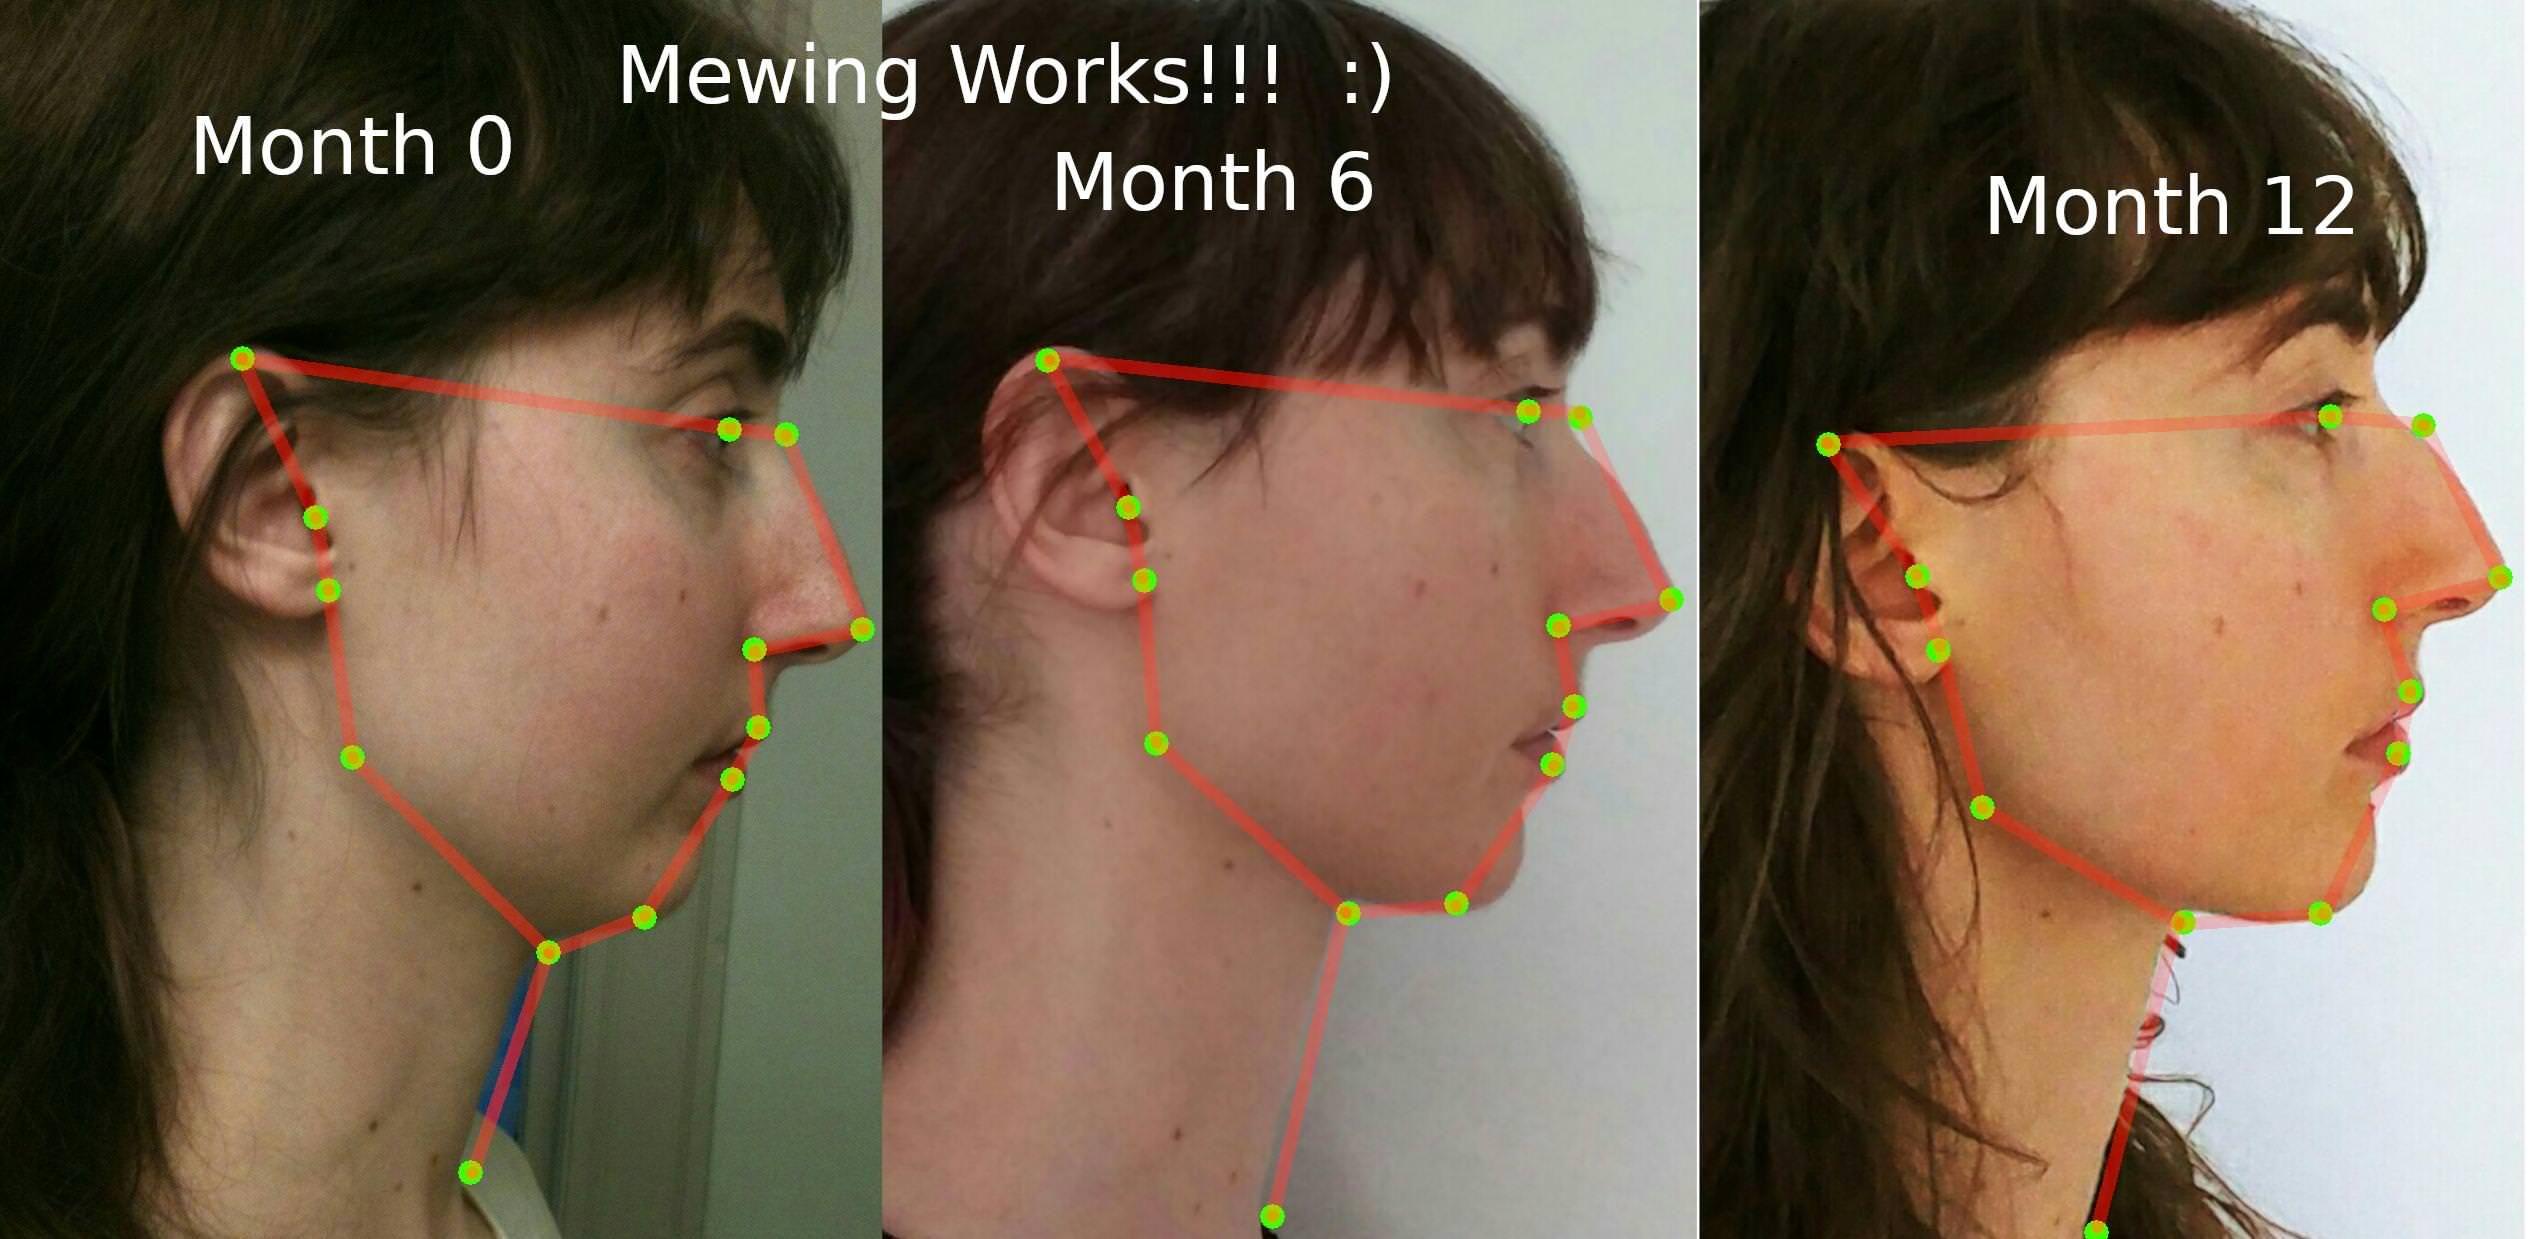 Mewing results the proper tongue posture mit bildern